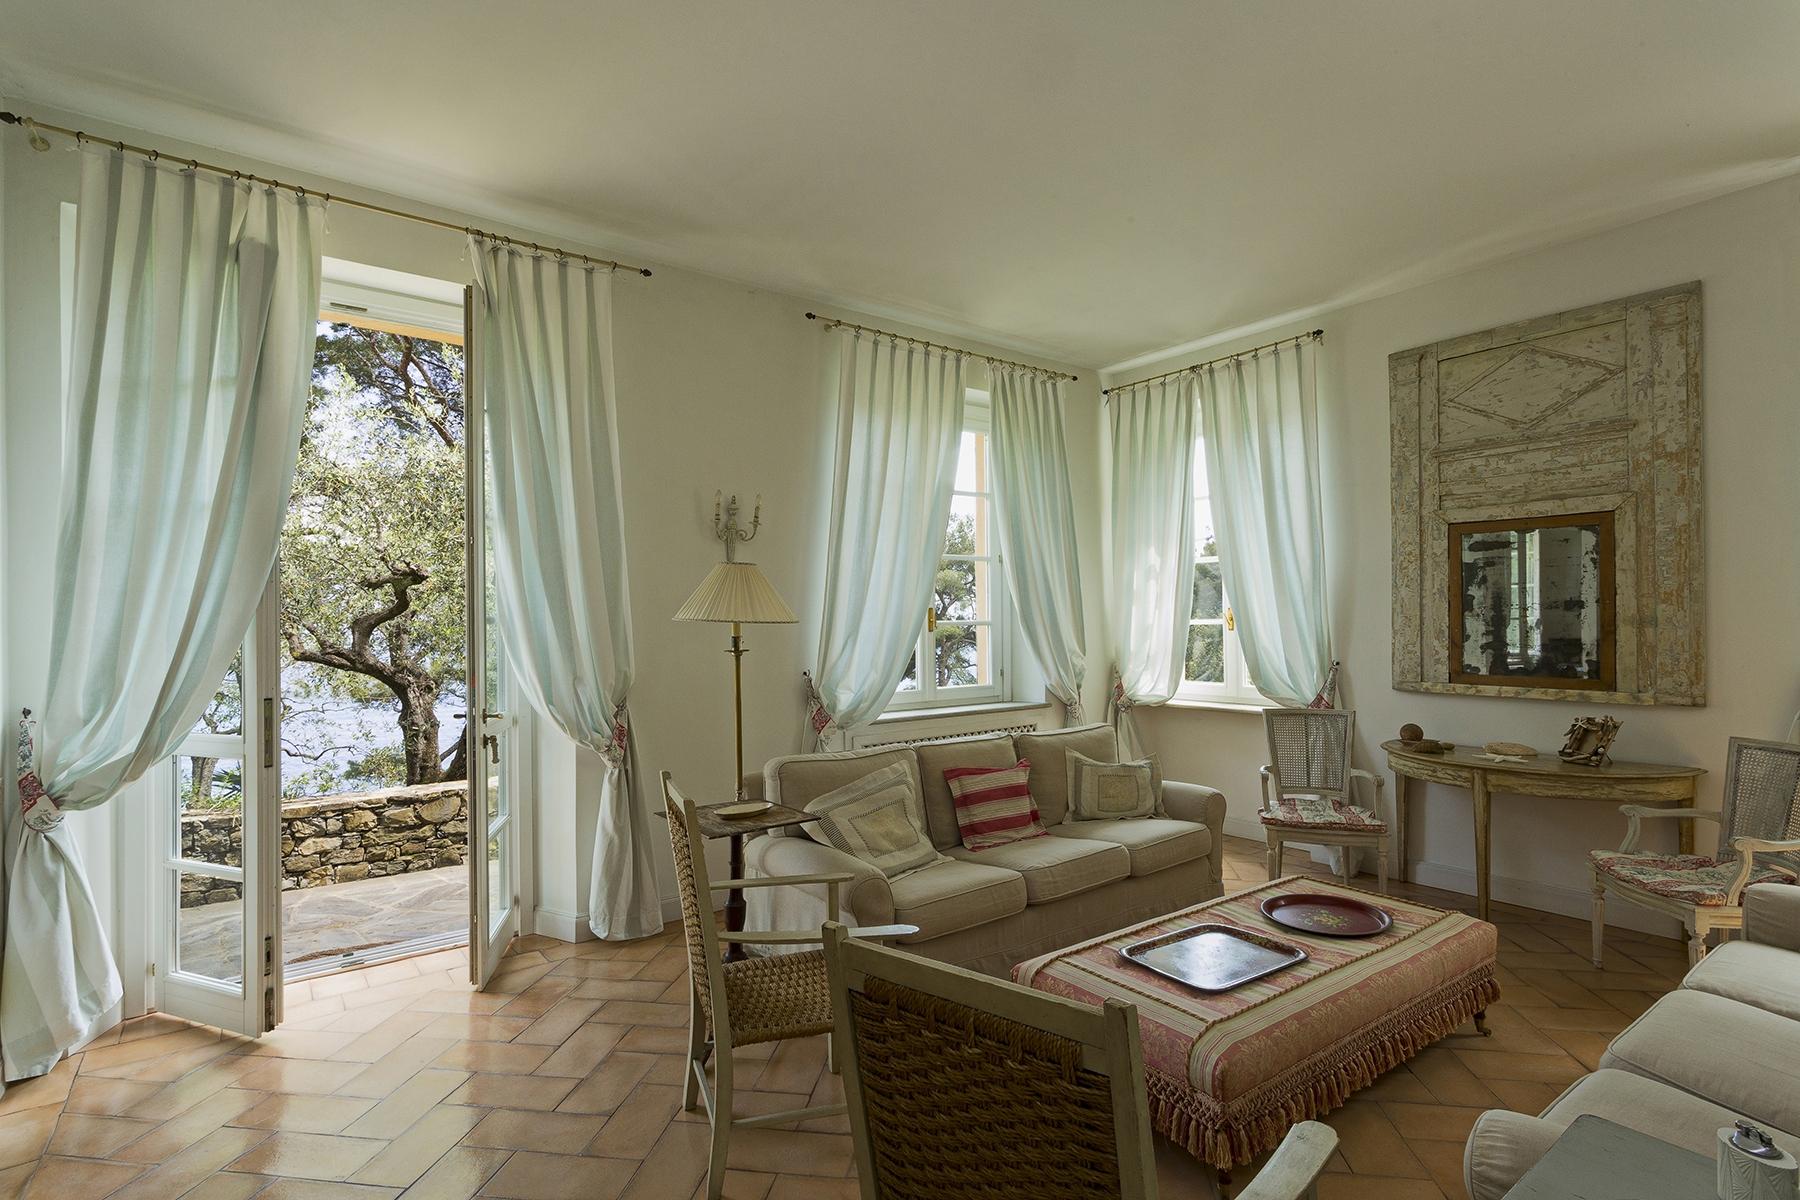 Villa in Vendita a Santa Margherita Ligure: 5 locali, 580 mq - Foto 27